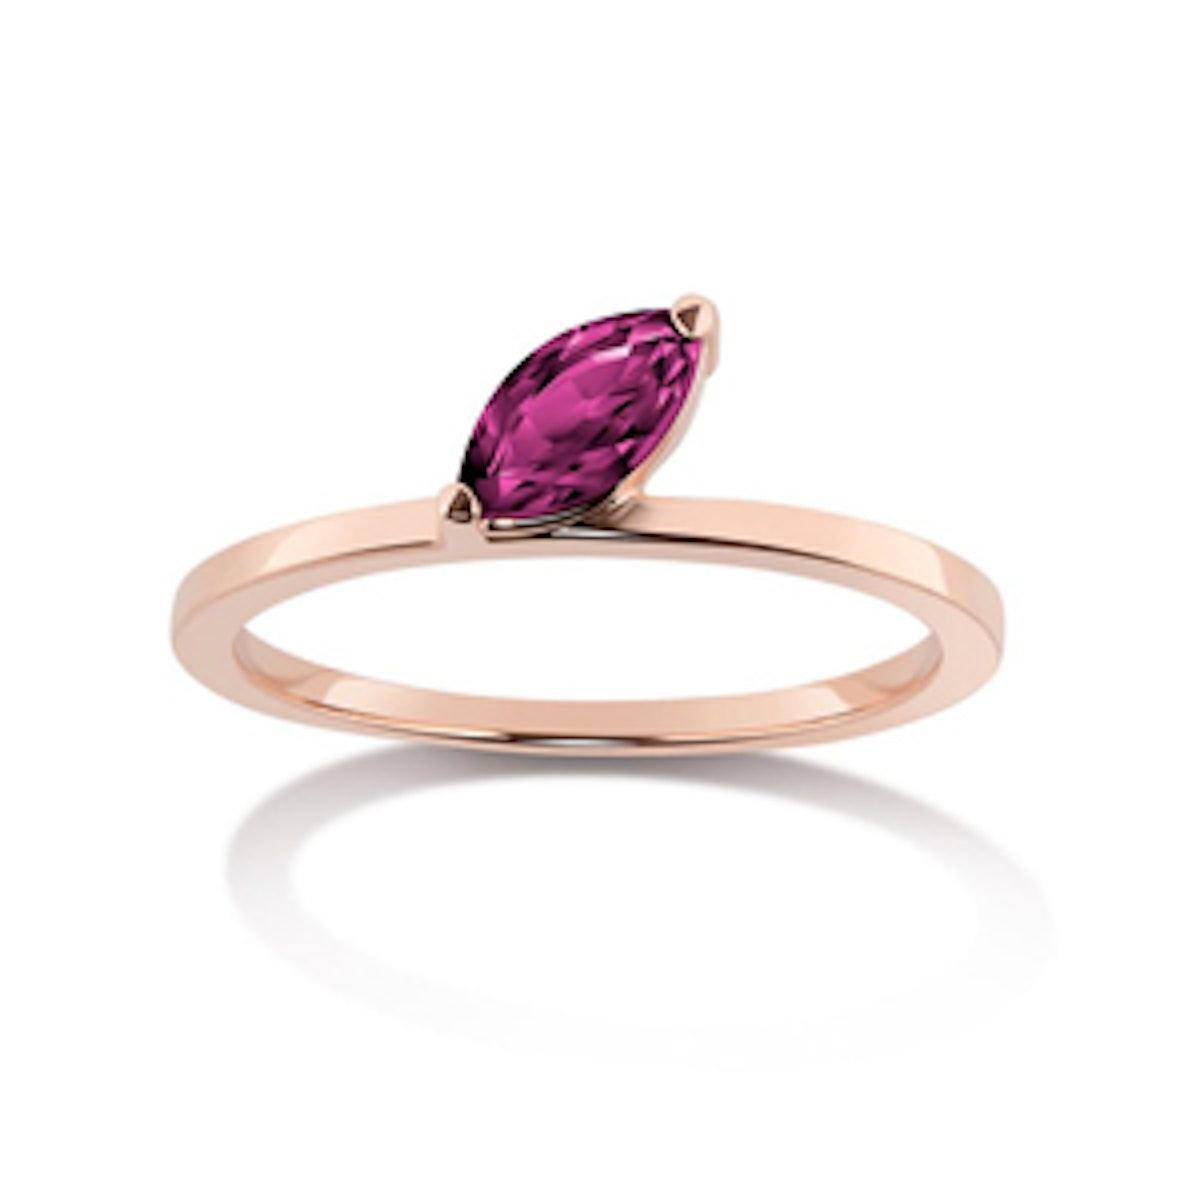 Defne Ruby Ring